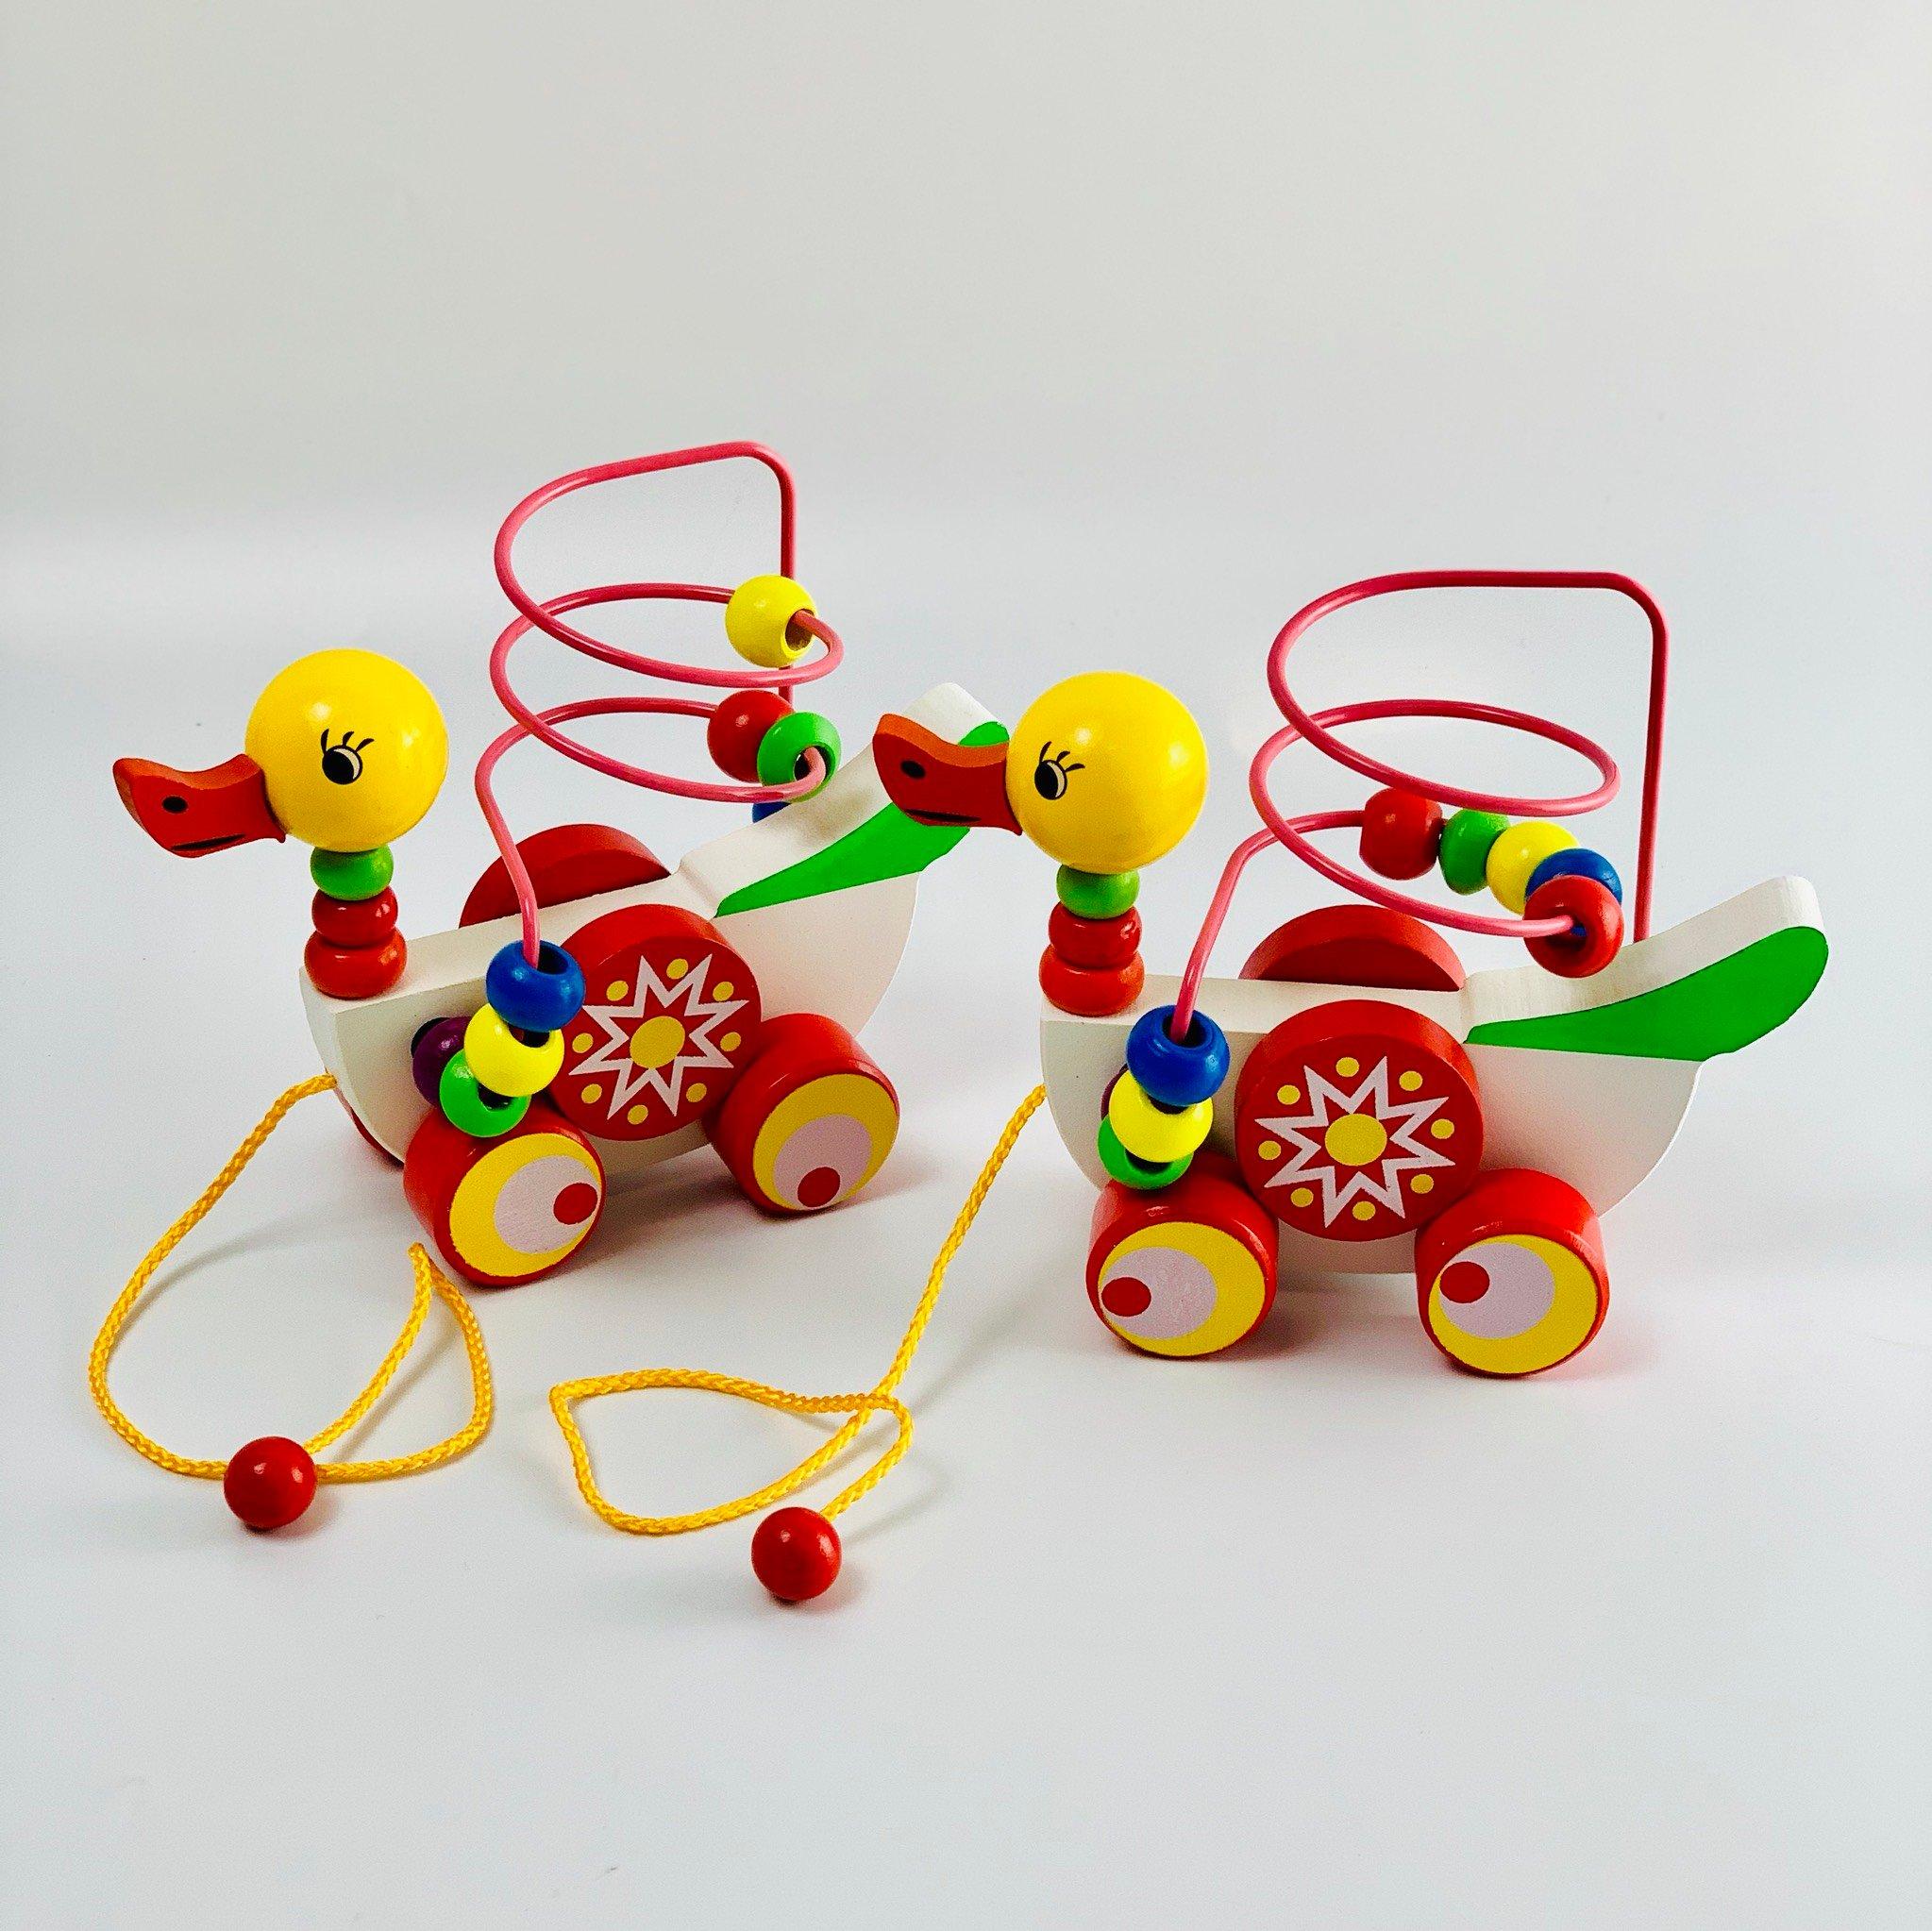 xe luồn hạt